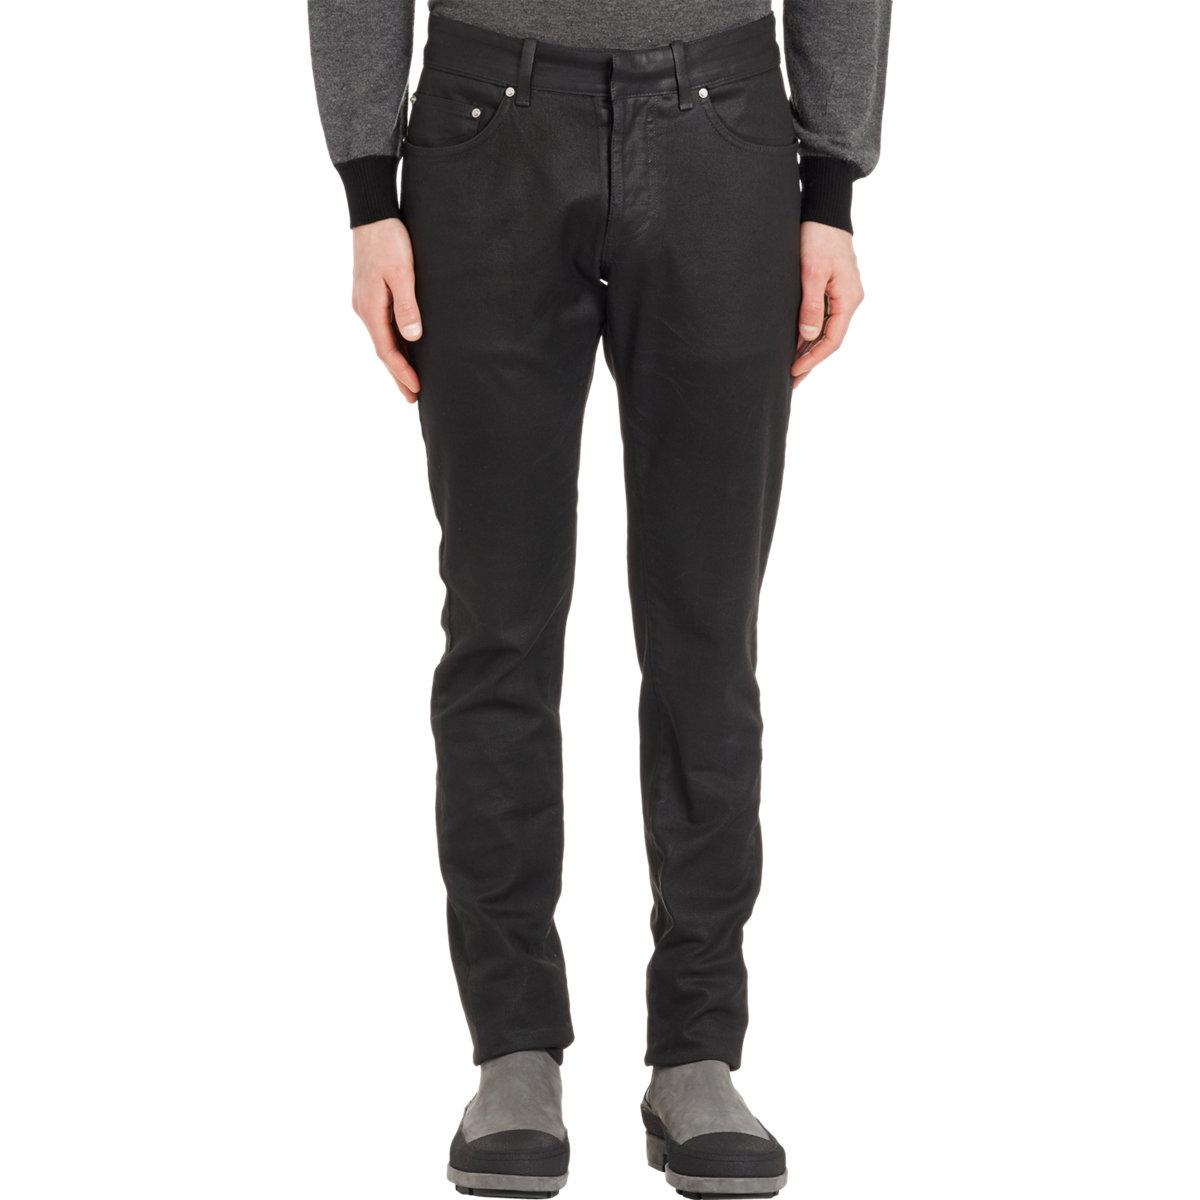 Black wax coated jeans